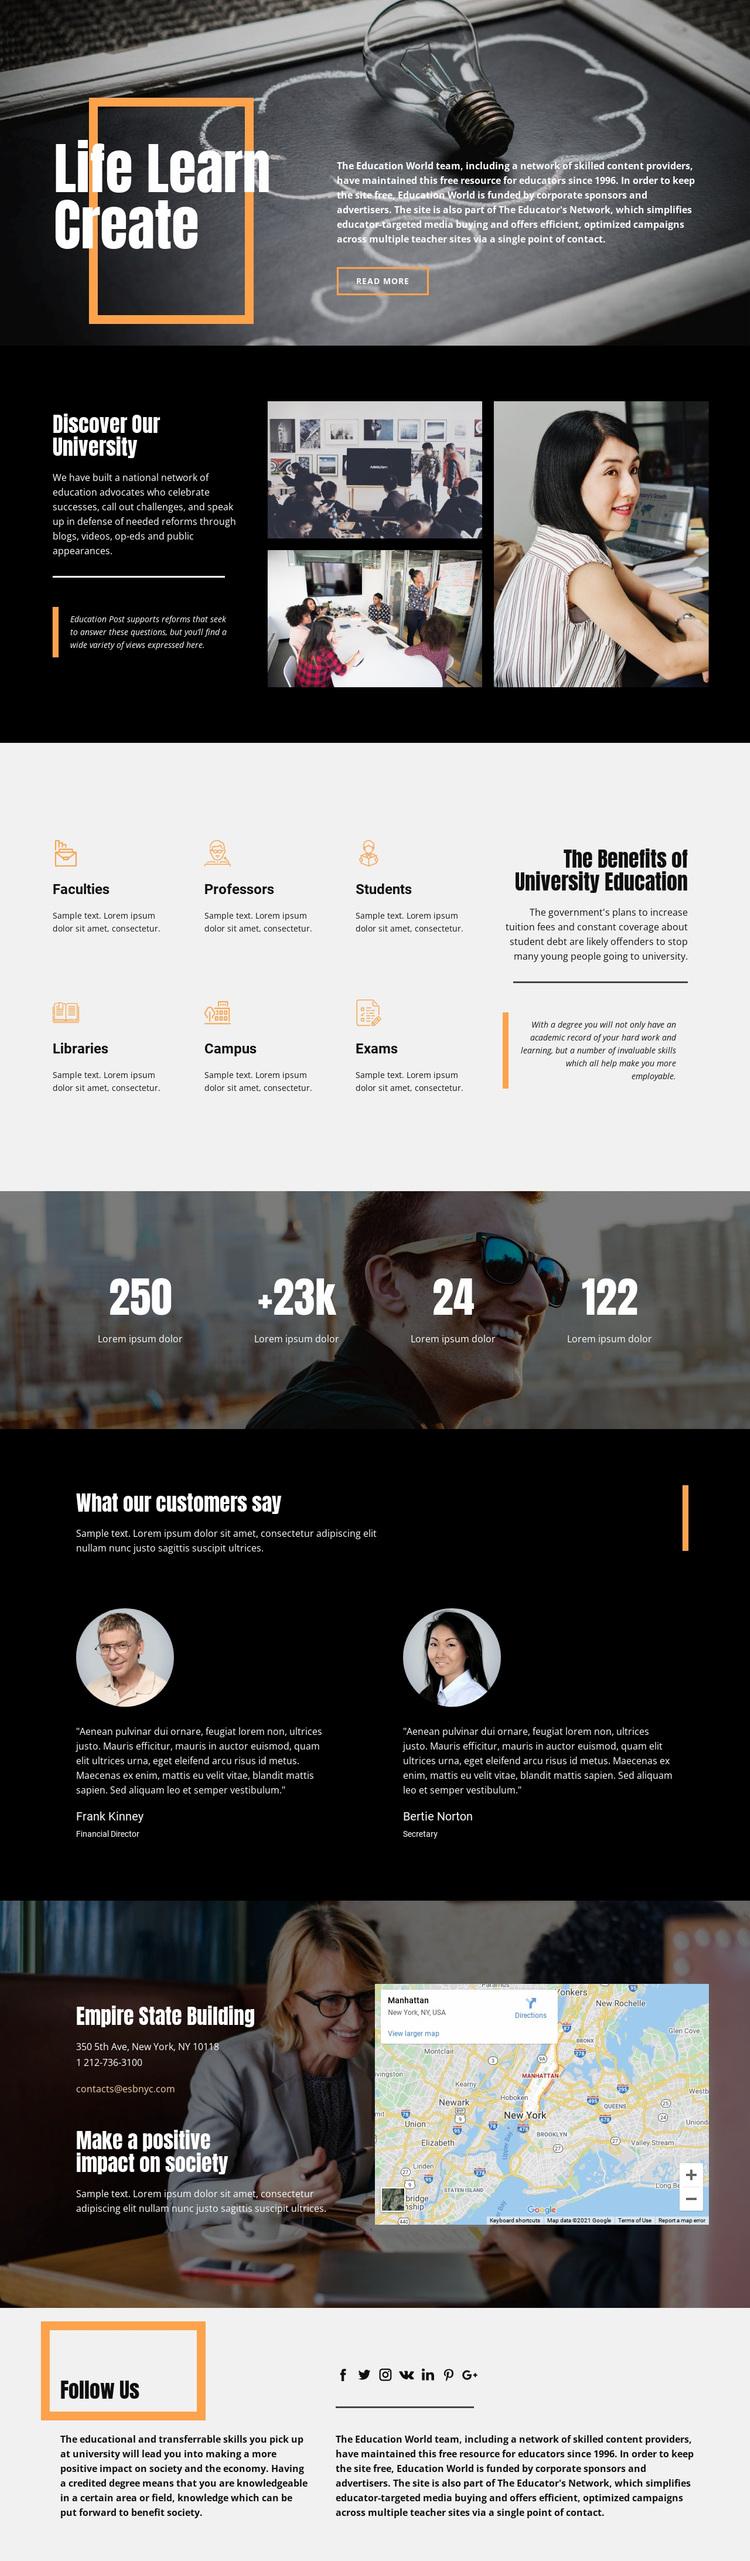 Discover highs of education Website Design